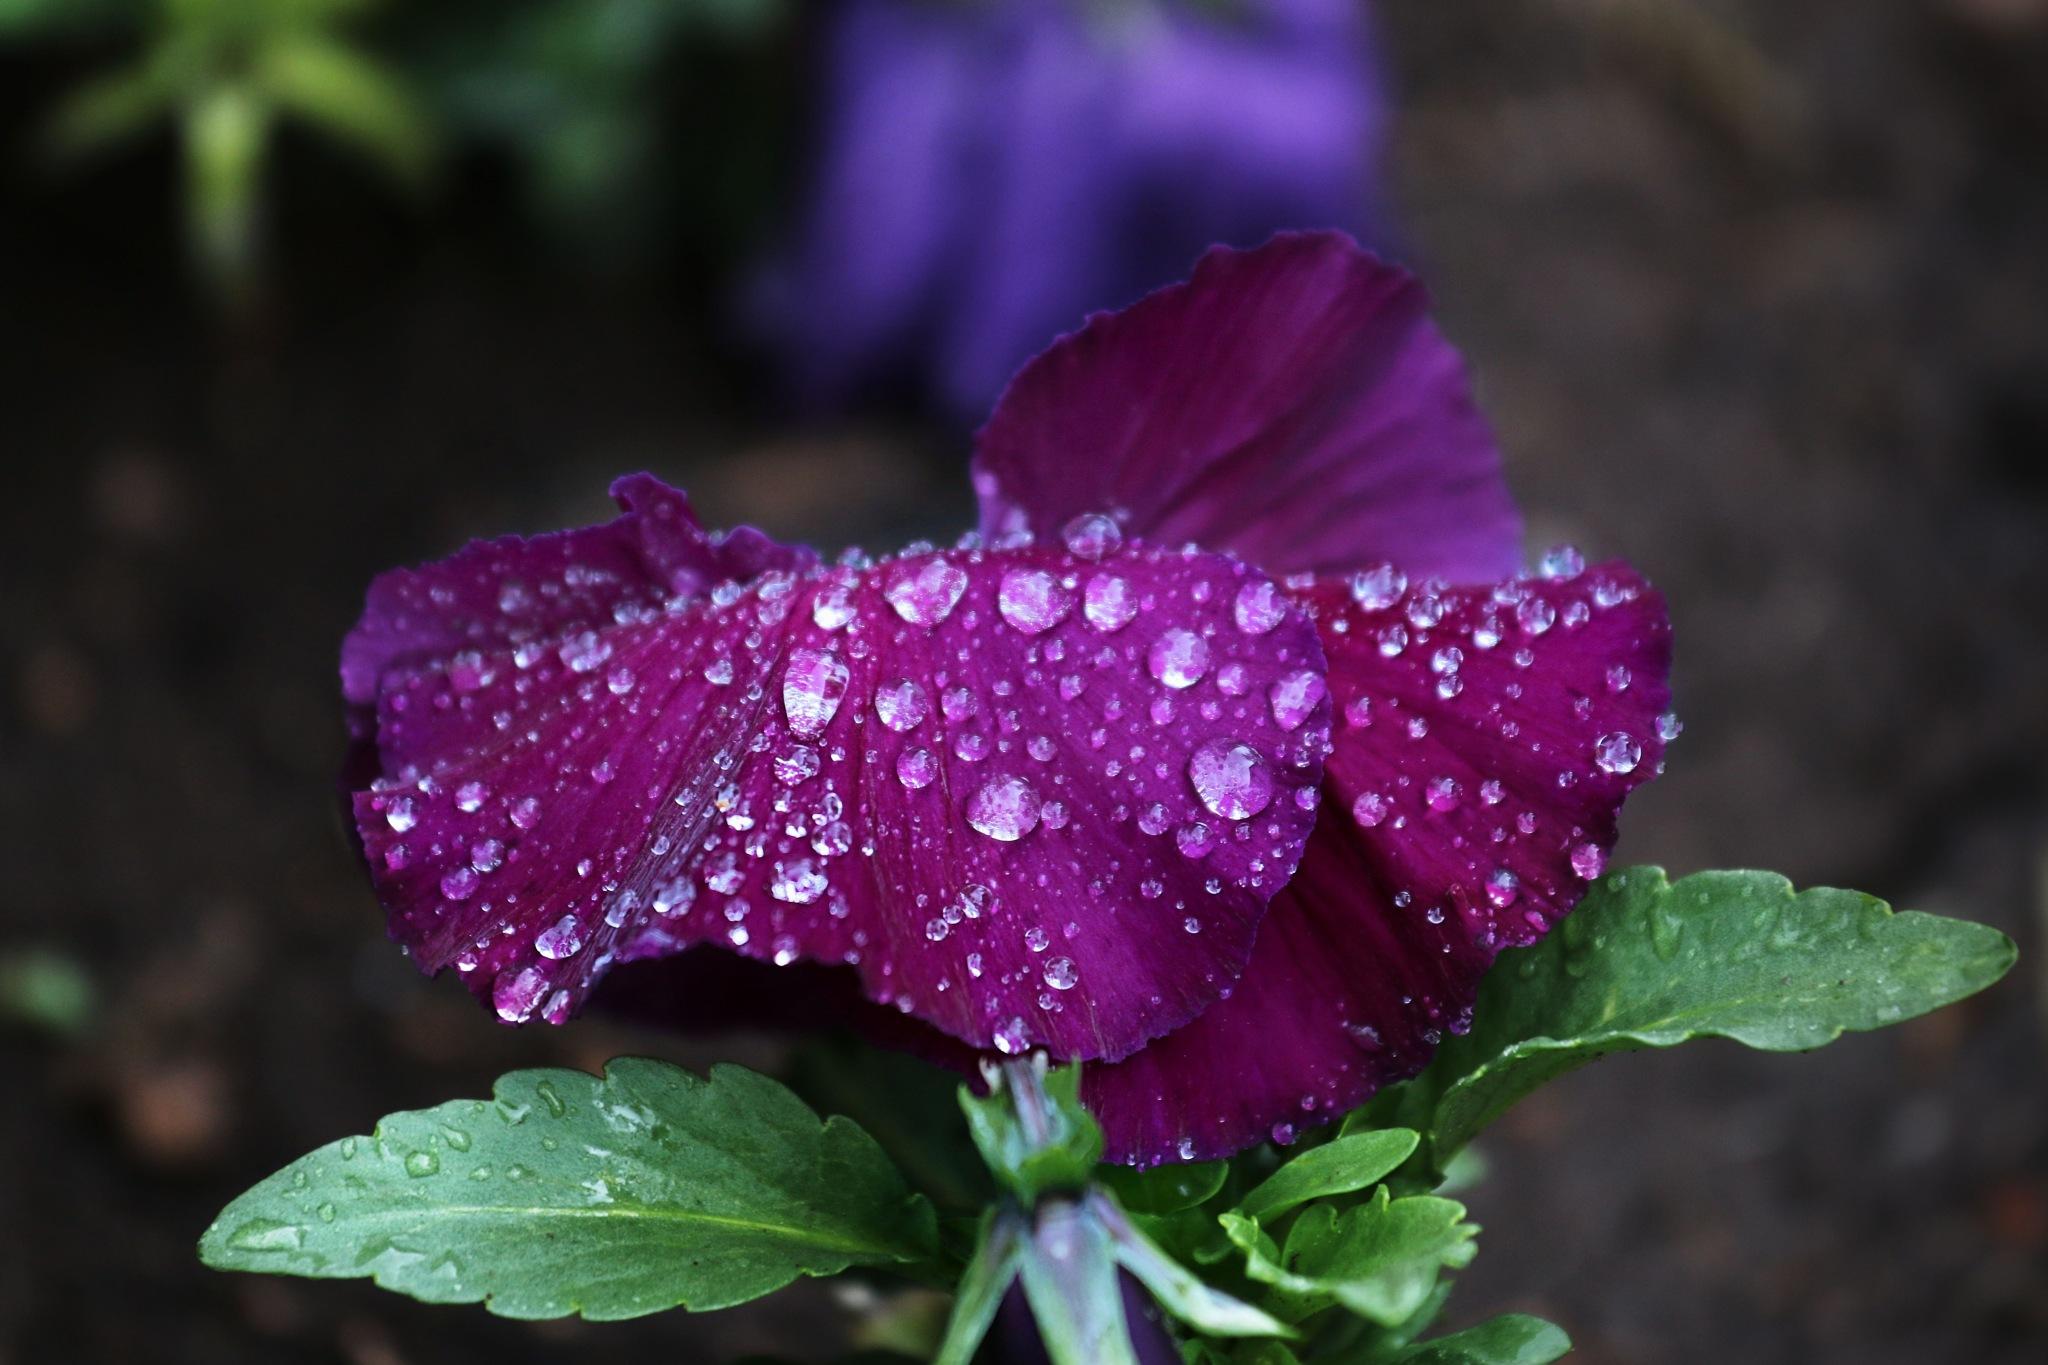 A Wet One by Rodney Tietjen